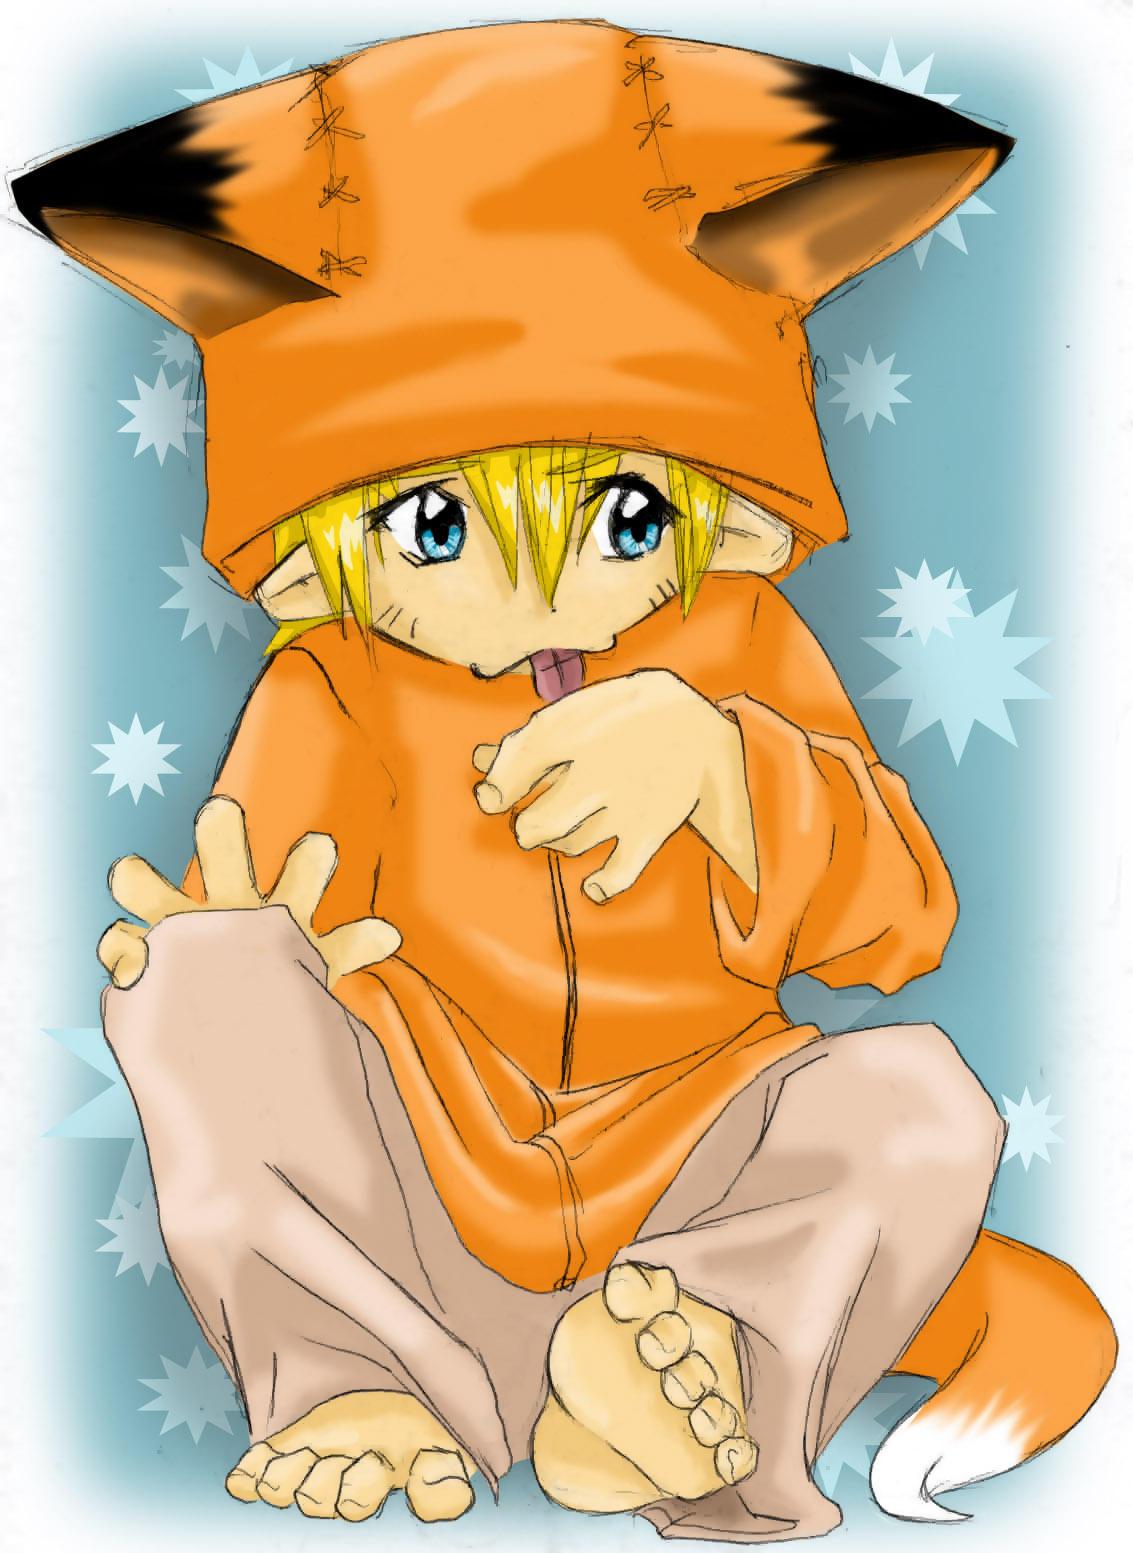 http://fc01.deviantart.com/fs4/i/2004/208/c/1/Chibi_Naruto.jpg